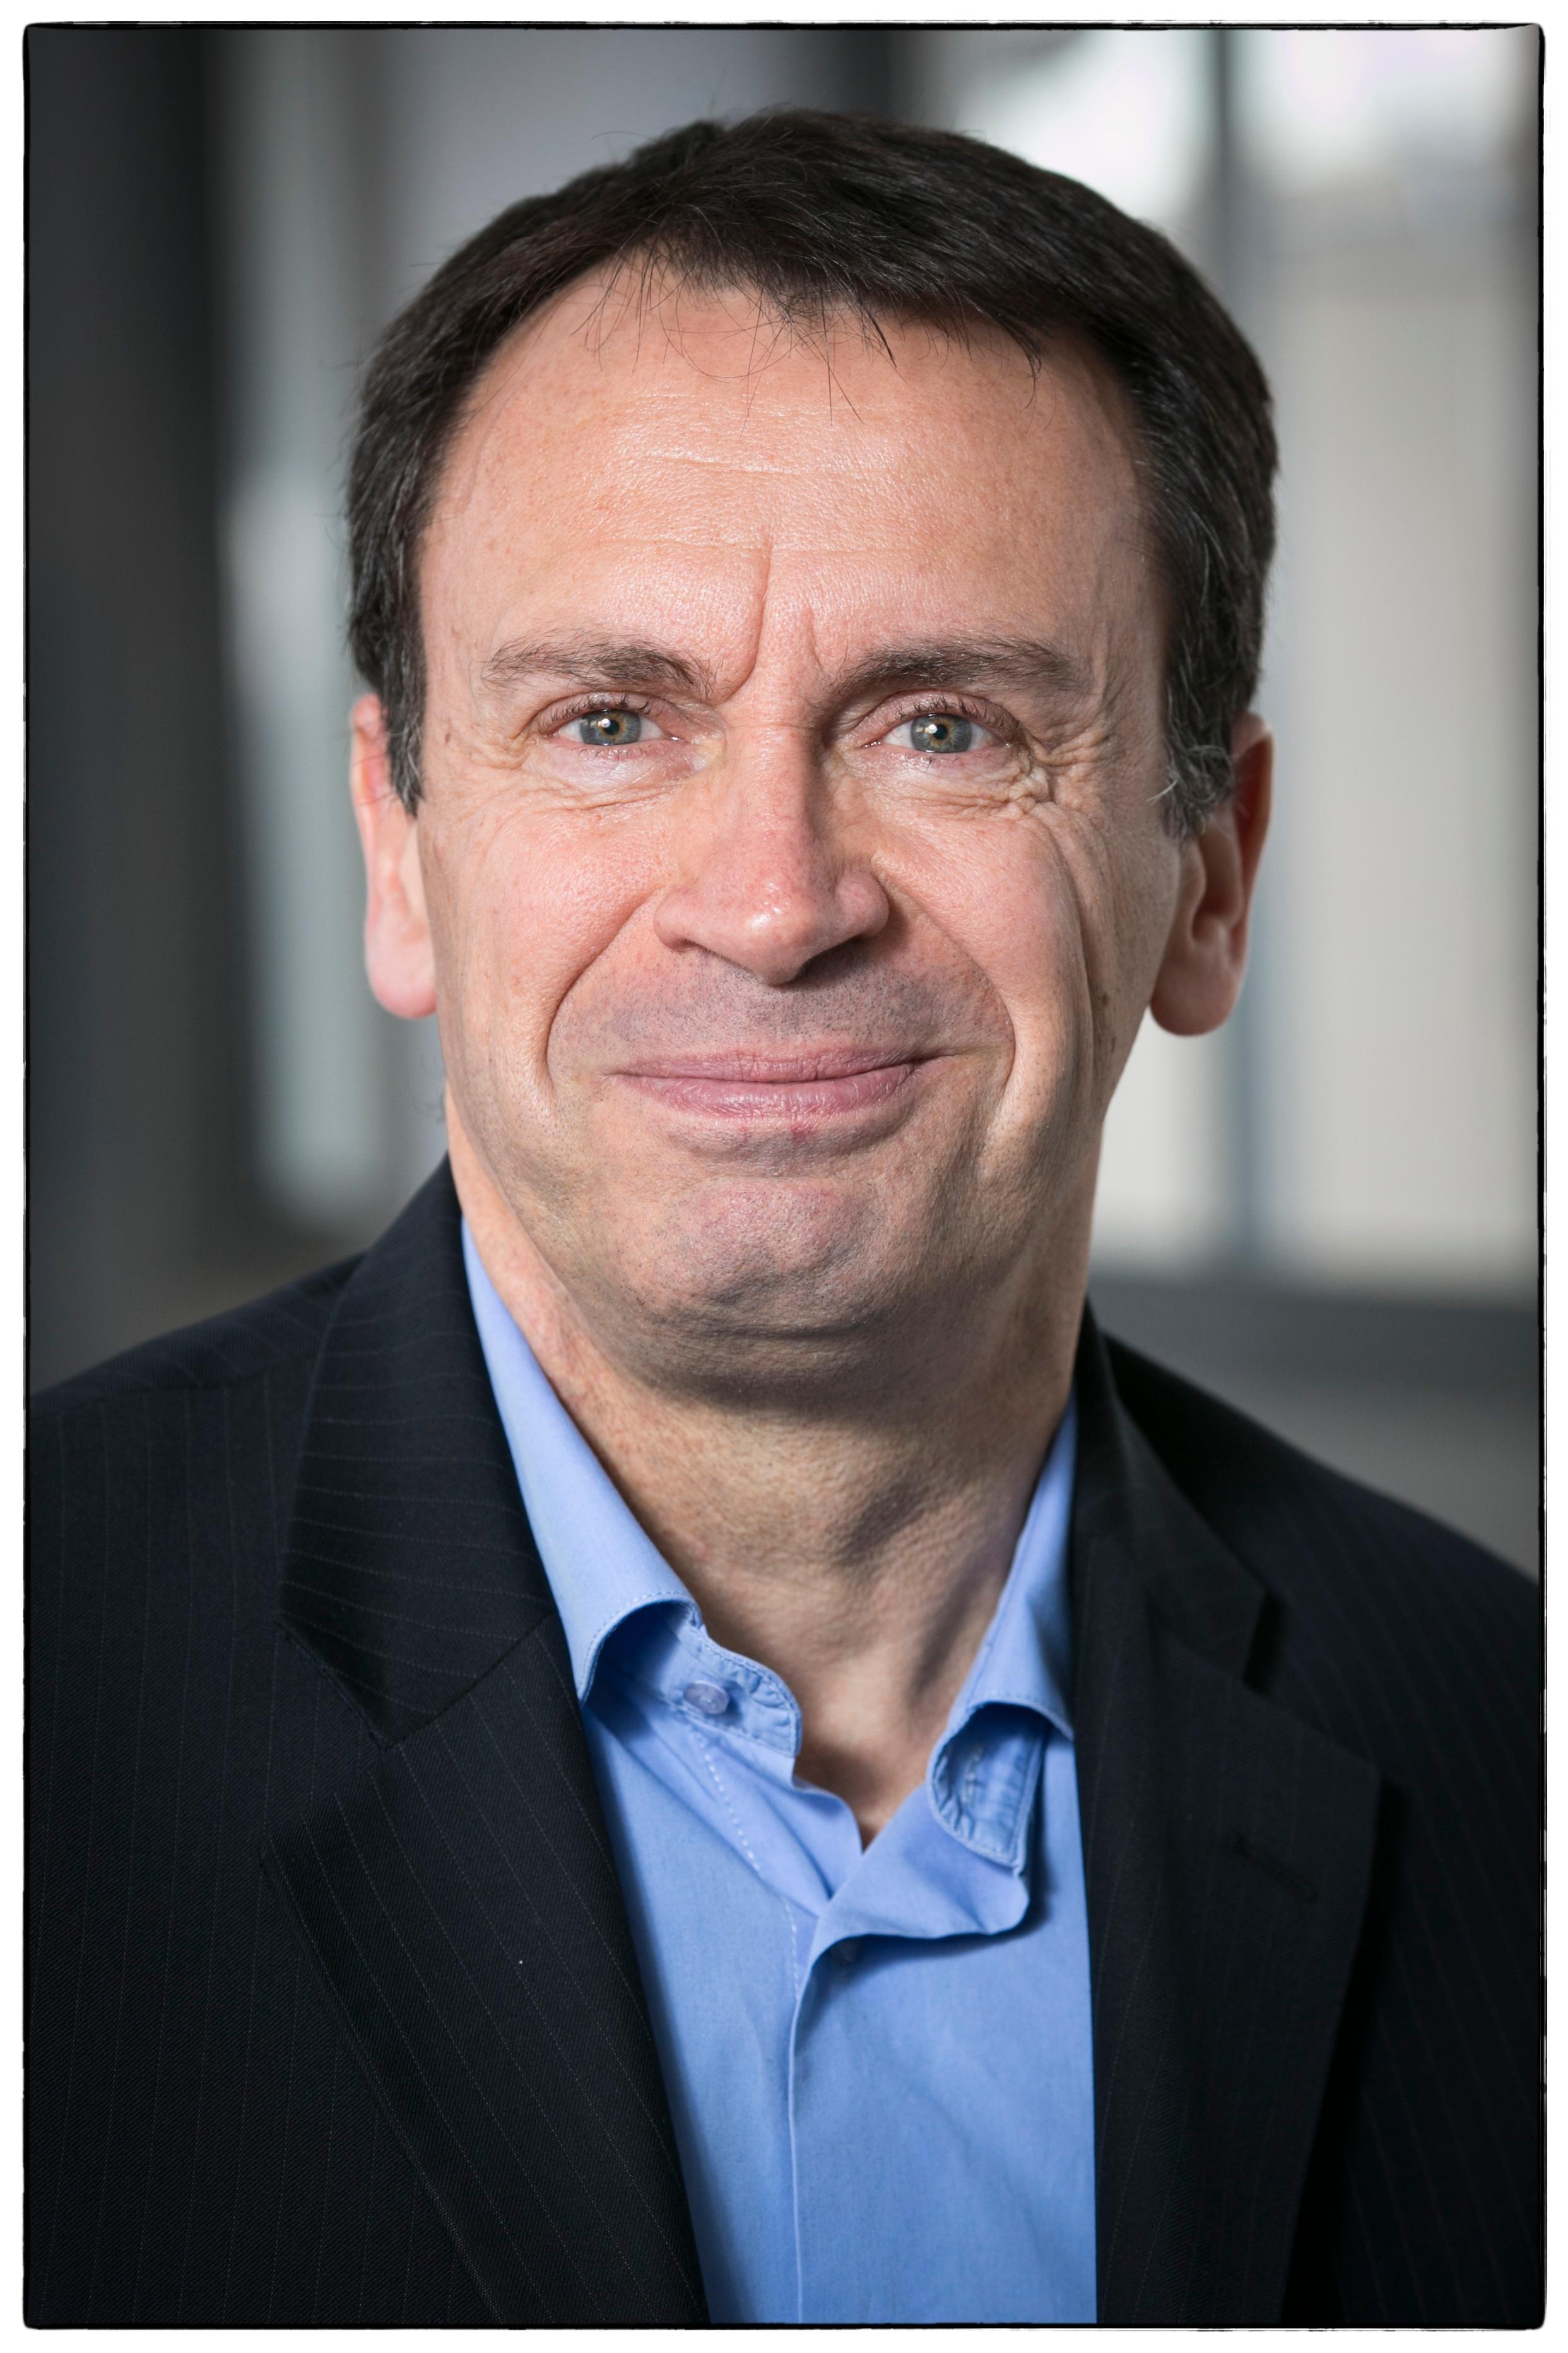 Pierre-Yves Deydier